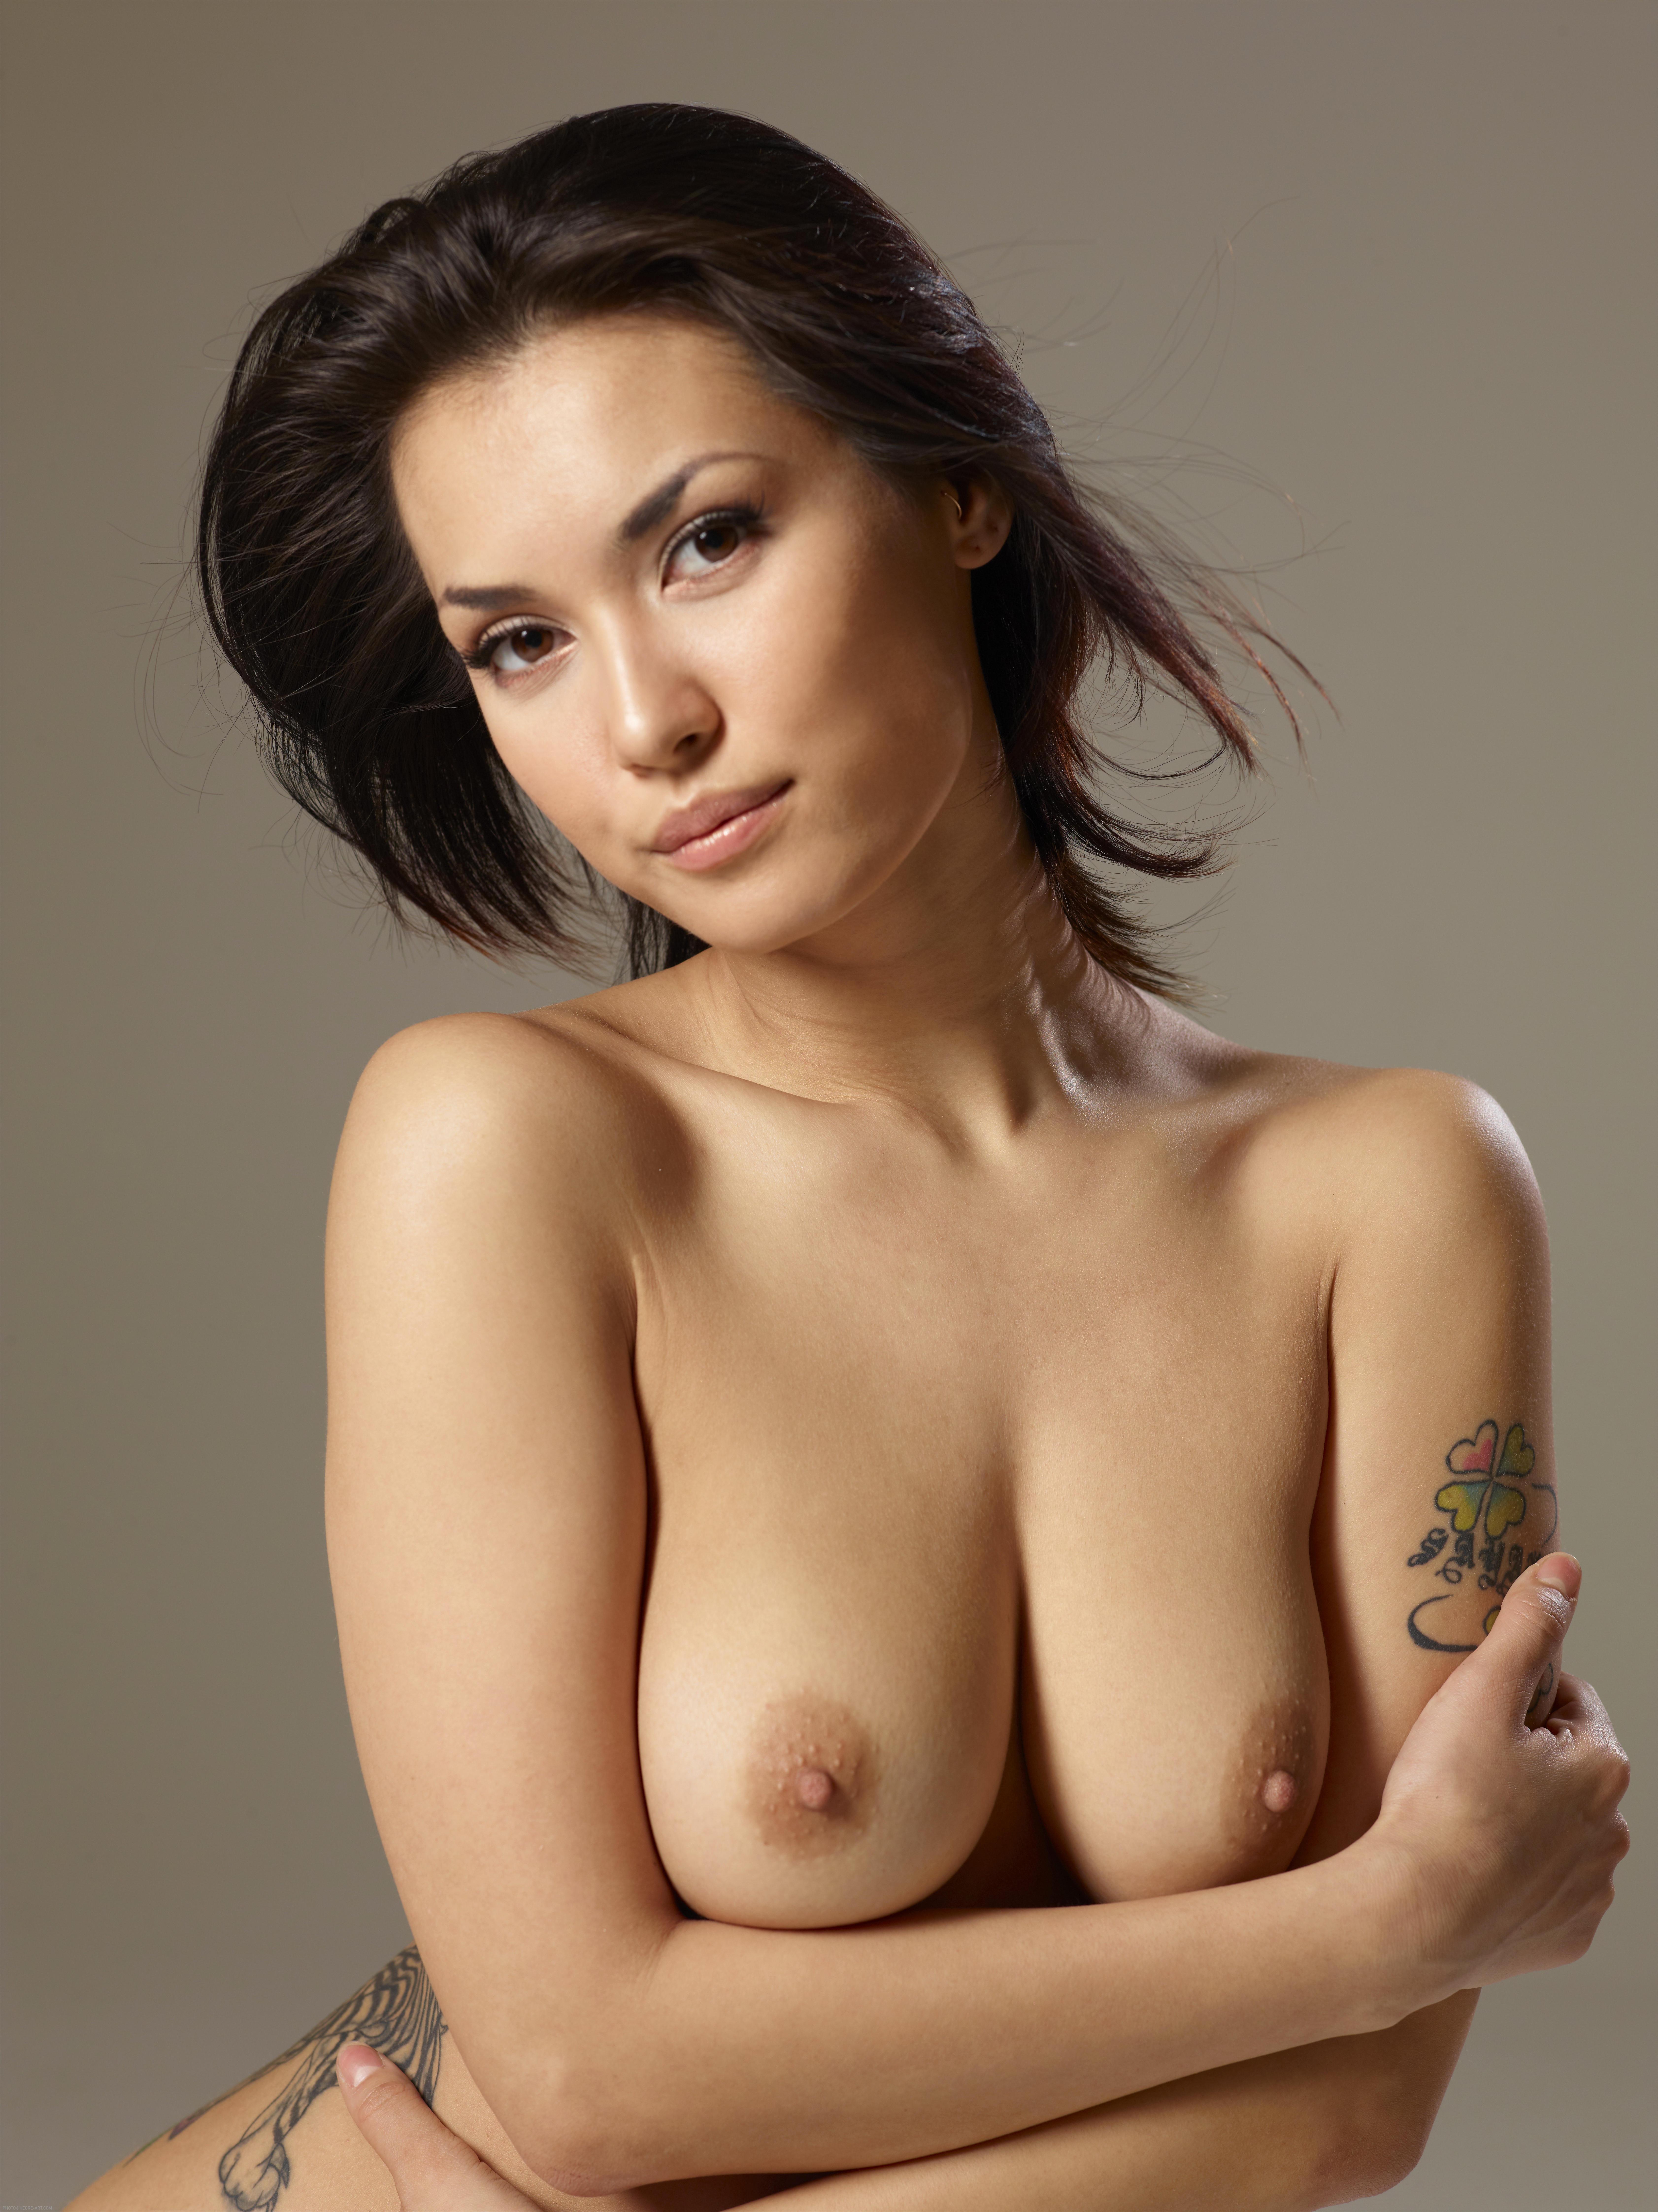 Maria asian porn torrent uncencered